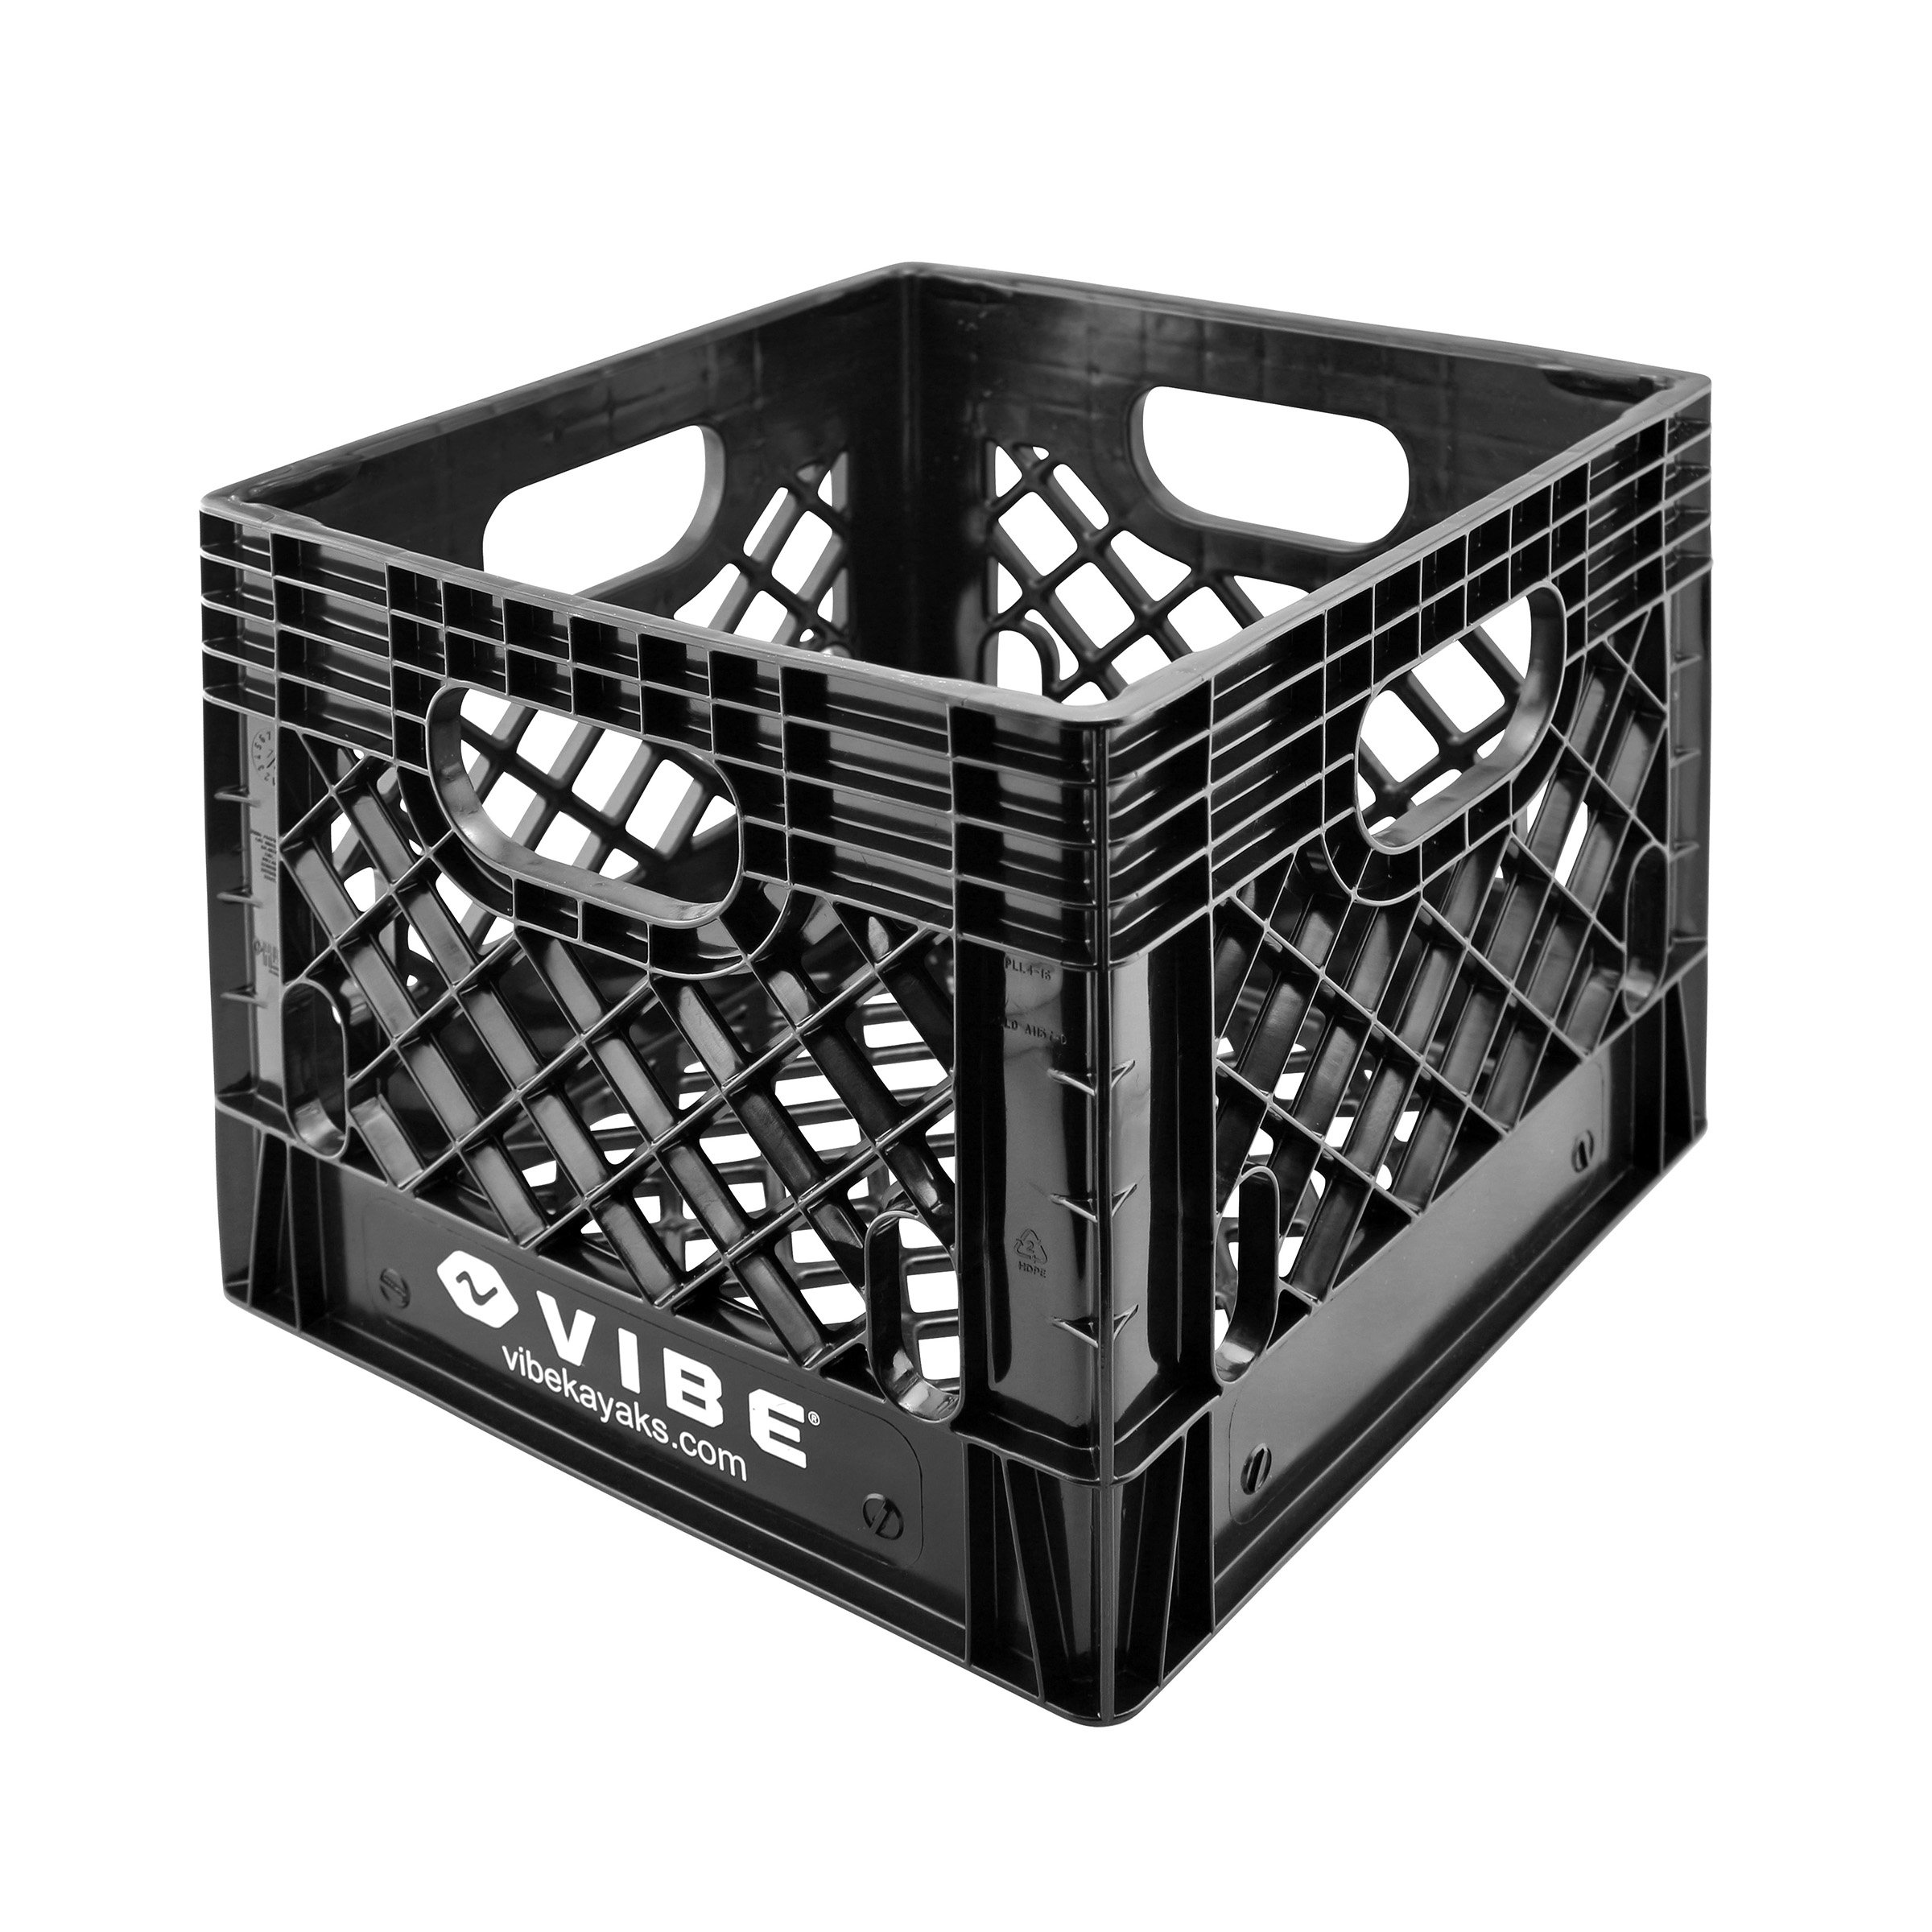 Vibe 16 Quart Milk Crate Camping Kayak Storage